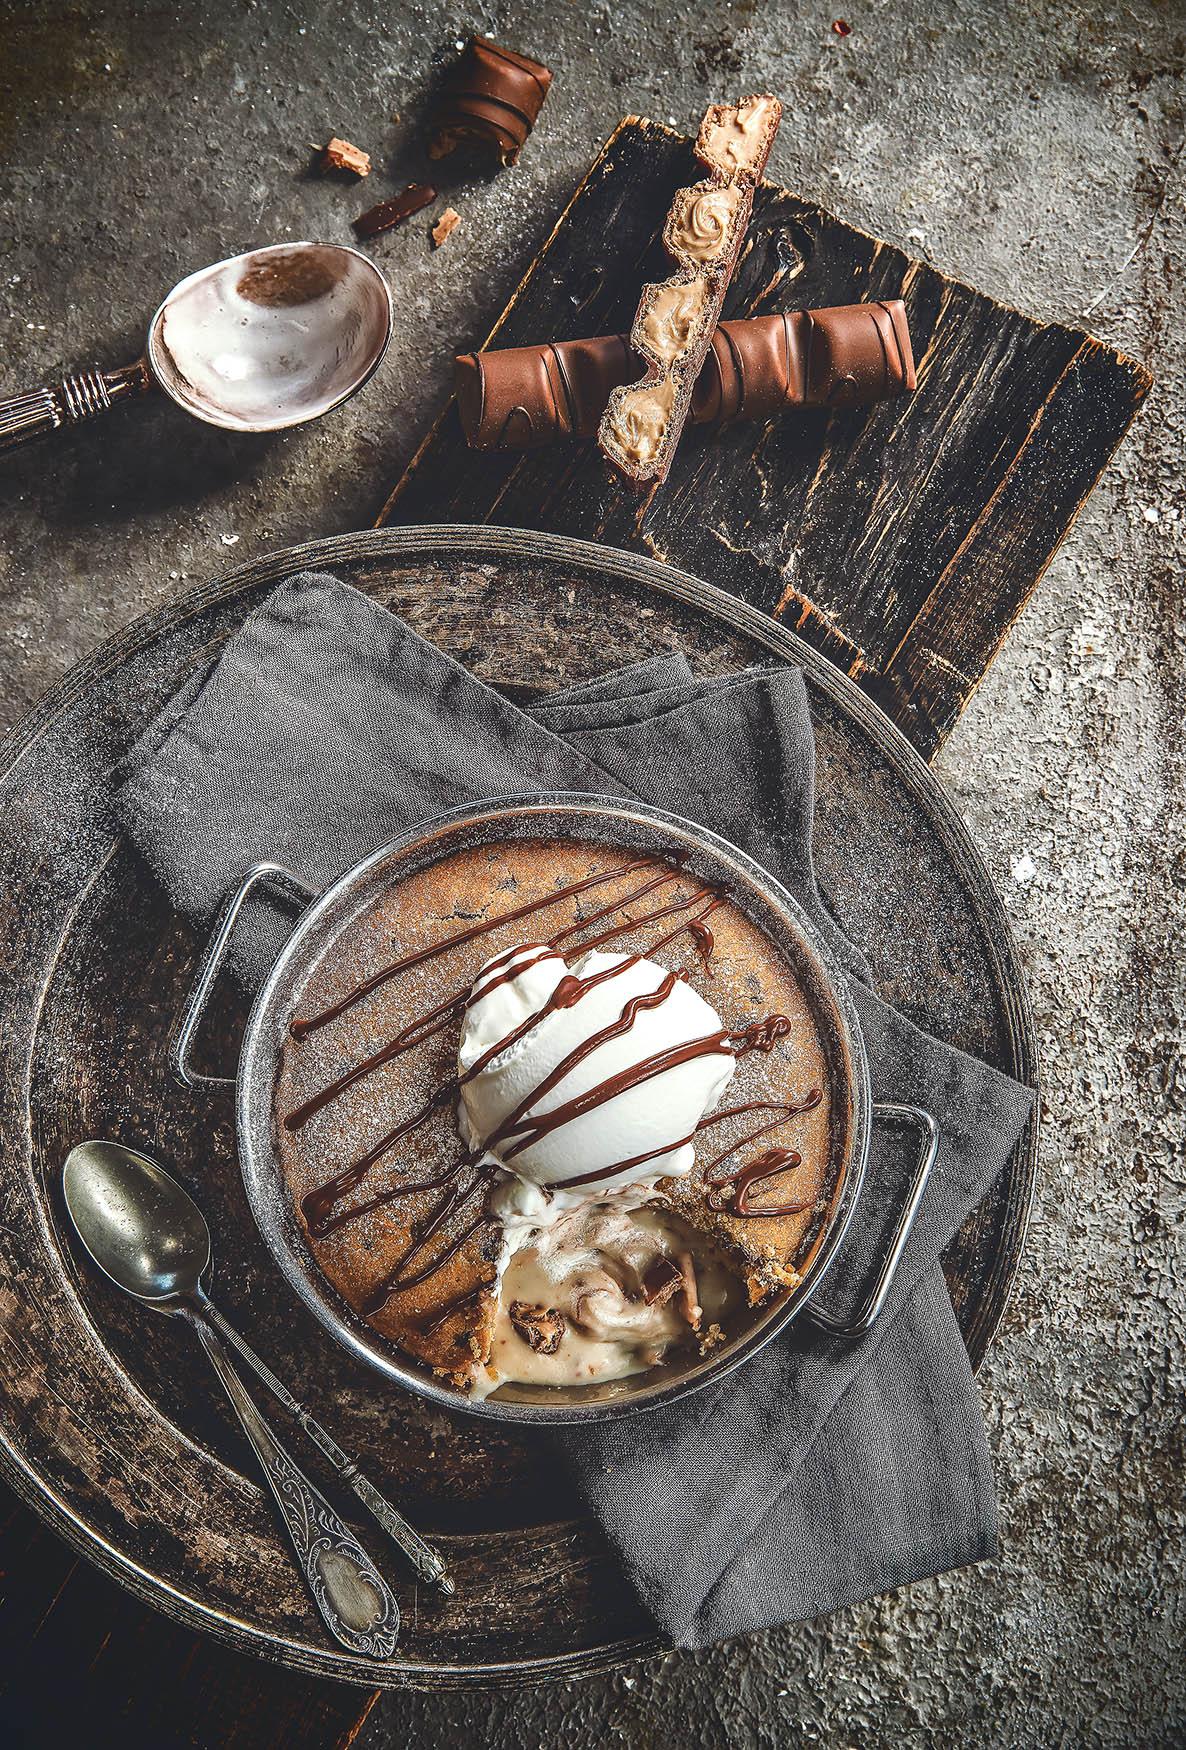 KindeMolten cake - Food photographer - Egypt - Mohamed Abdel-Hady